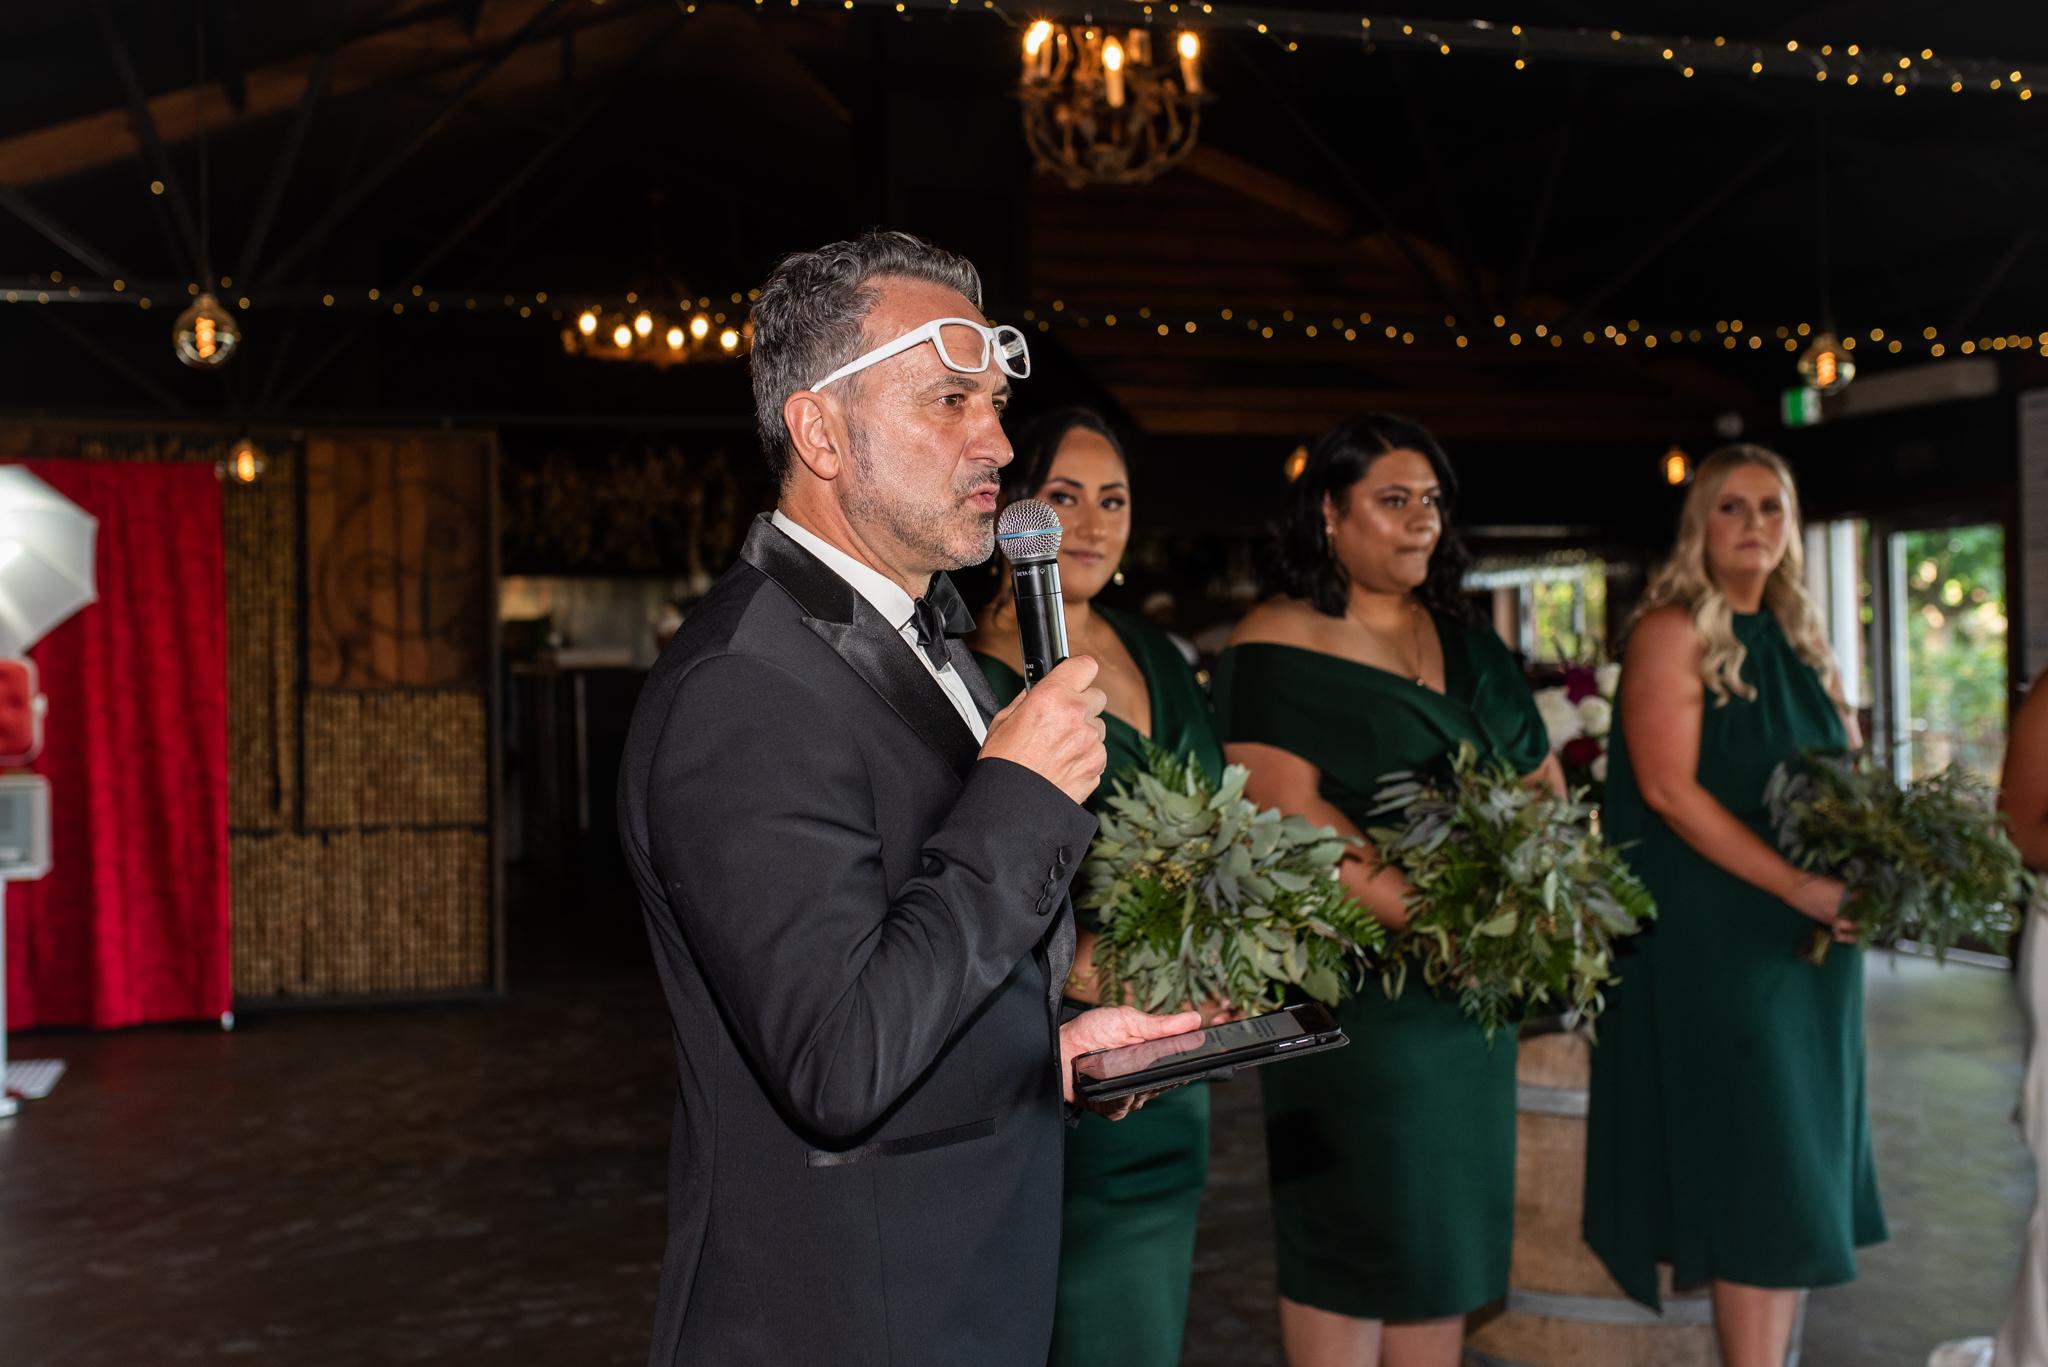 Geelong wedding celebrant